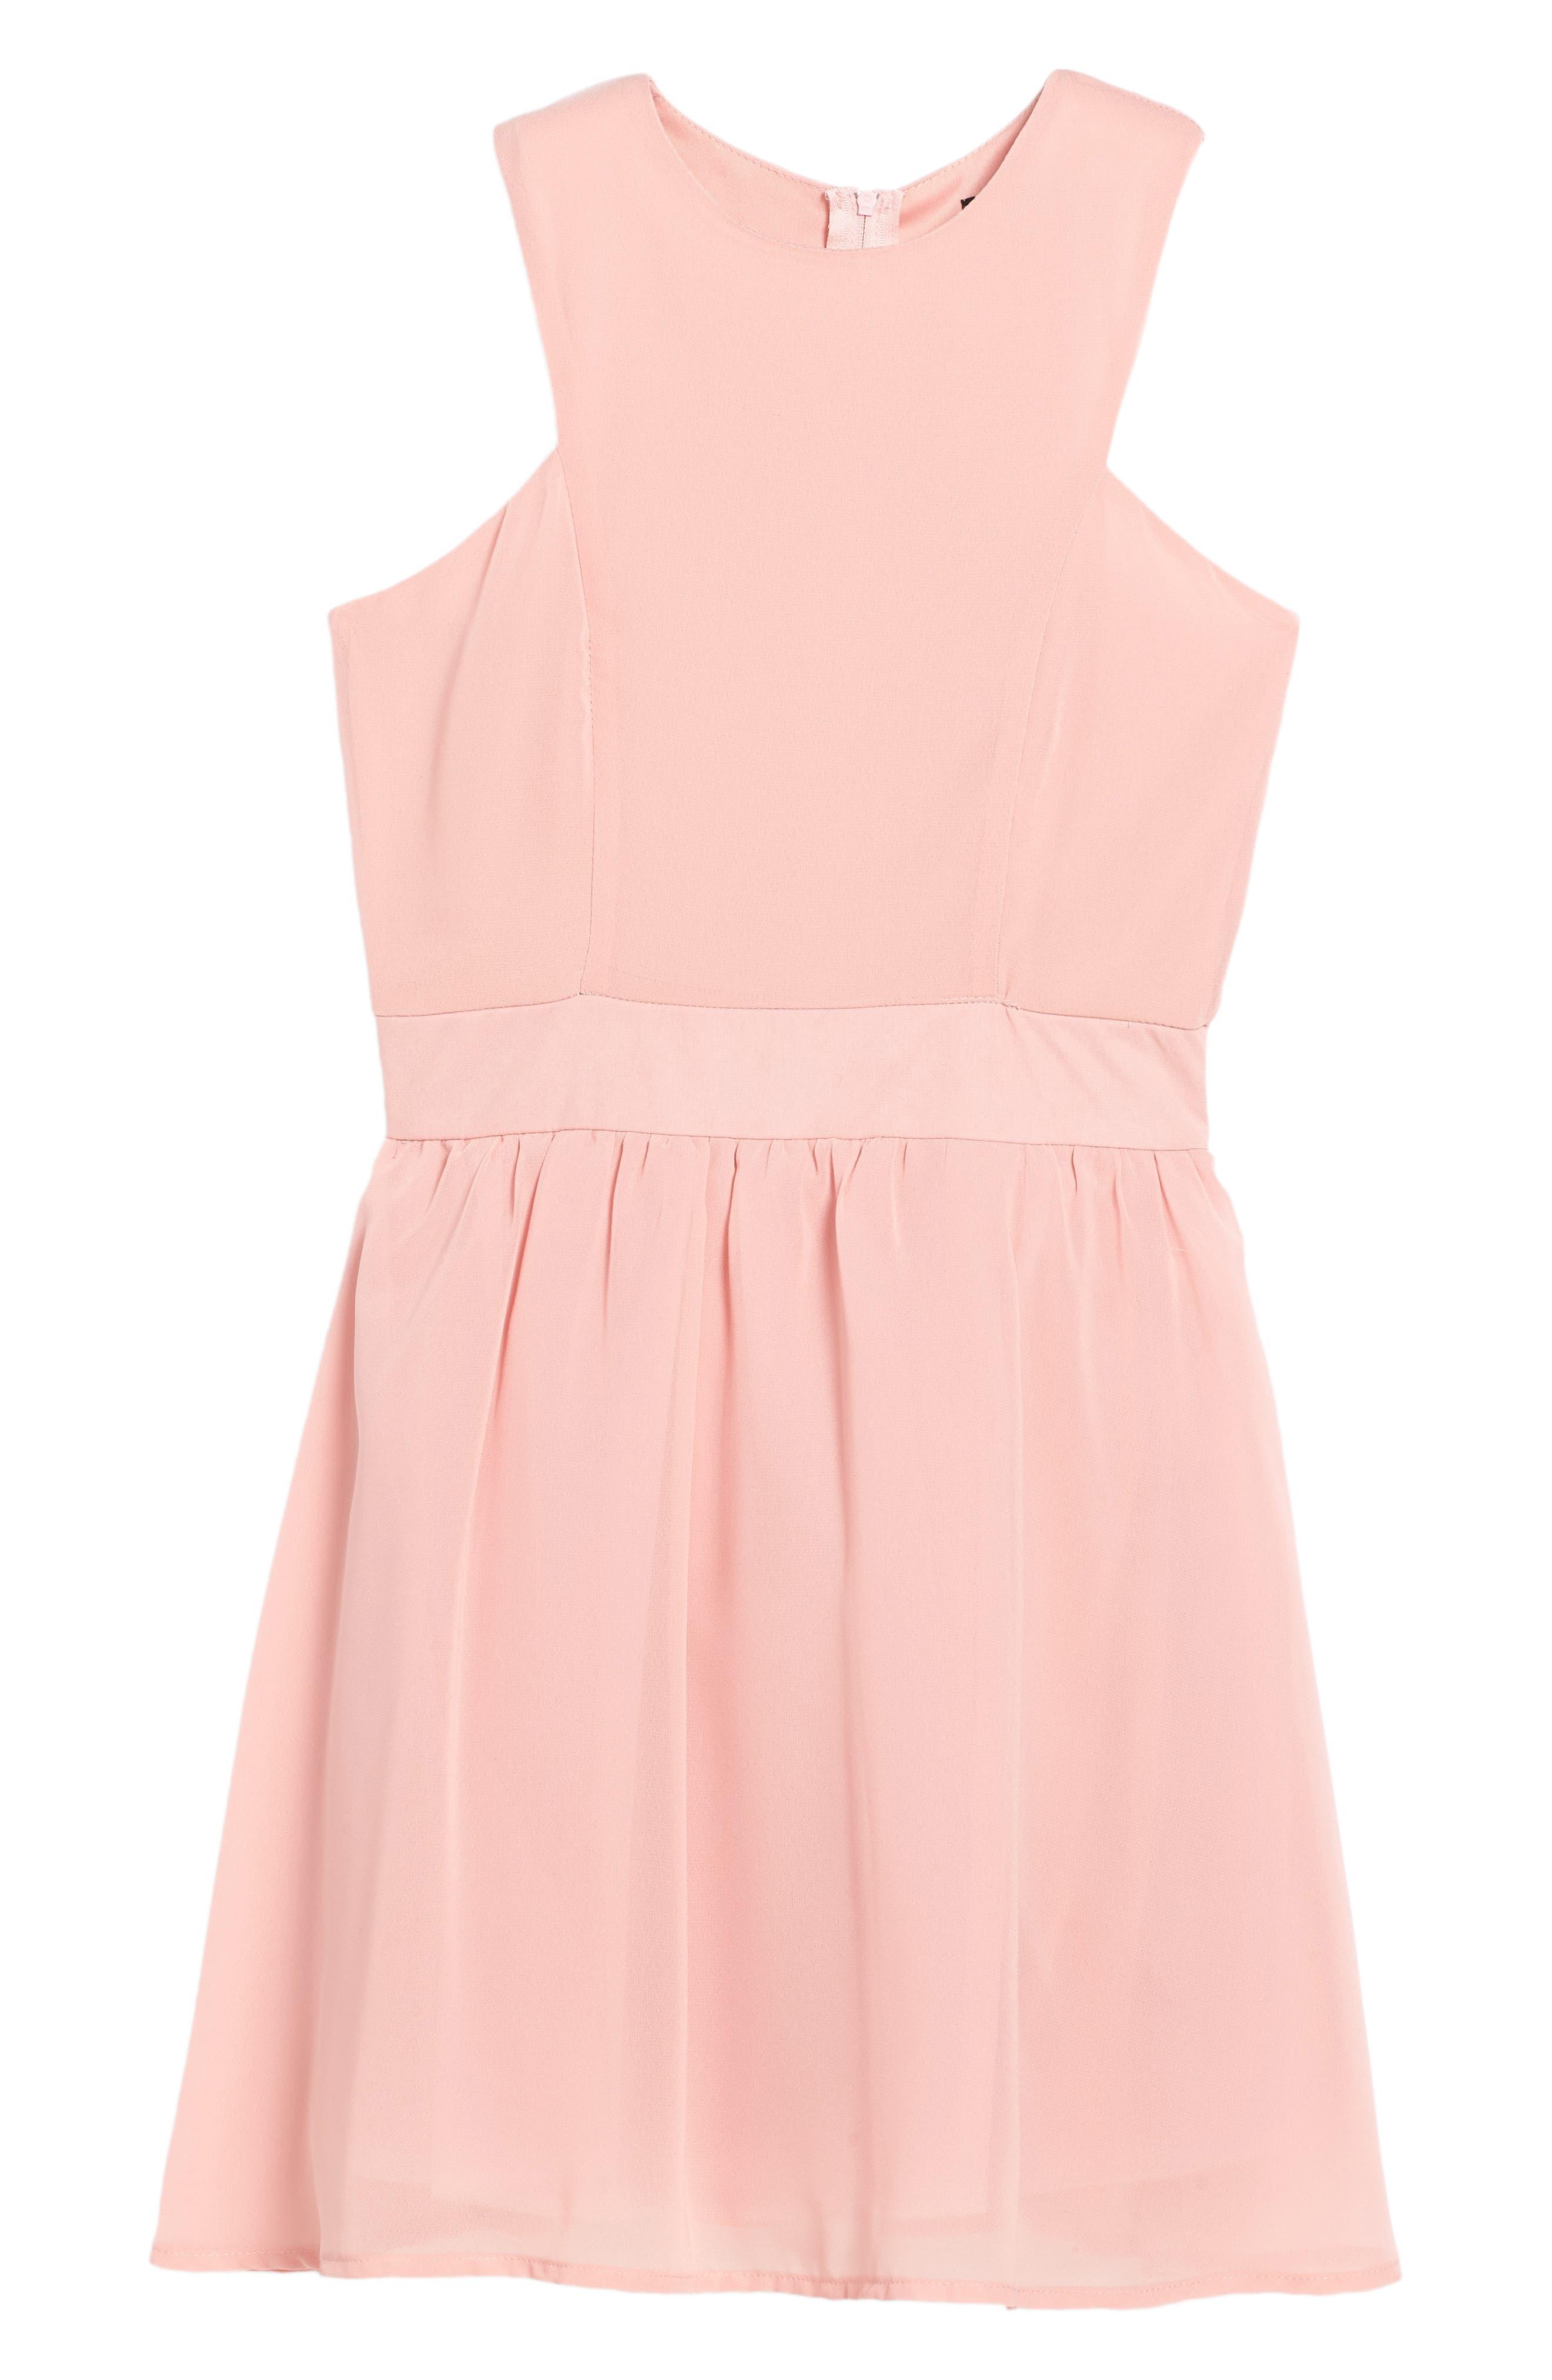 Camilla Sleeveless Dress,                         Main,                         color, Pink